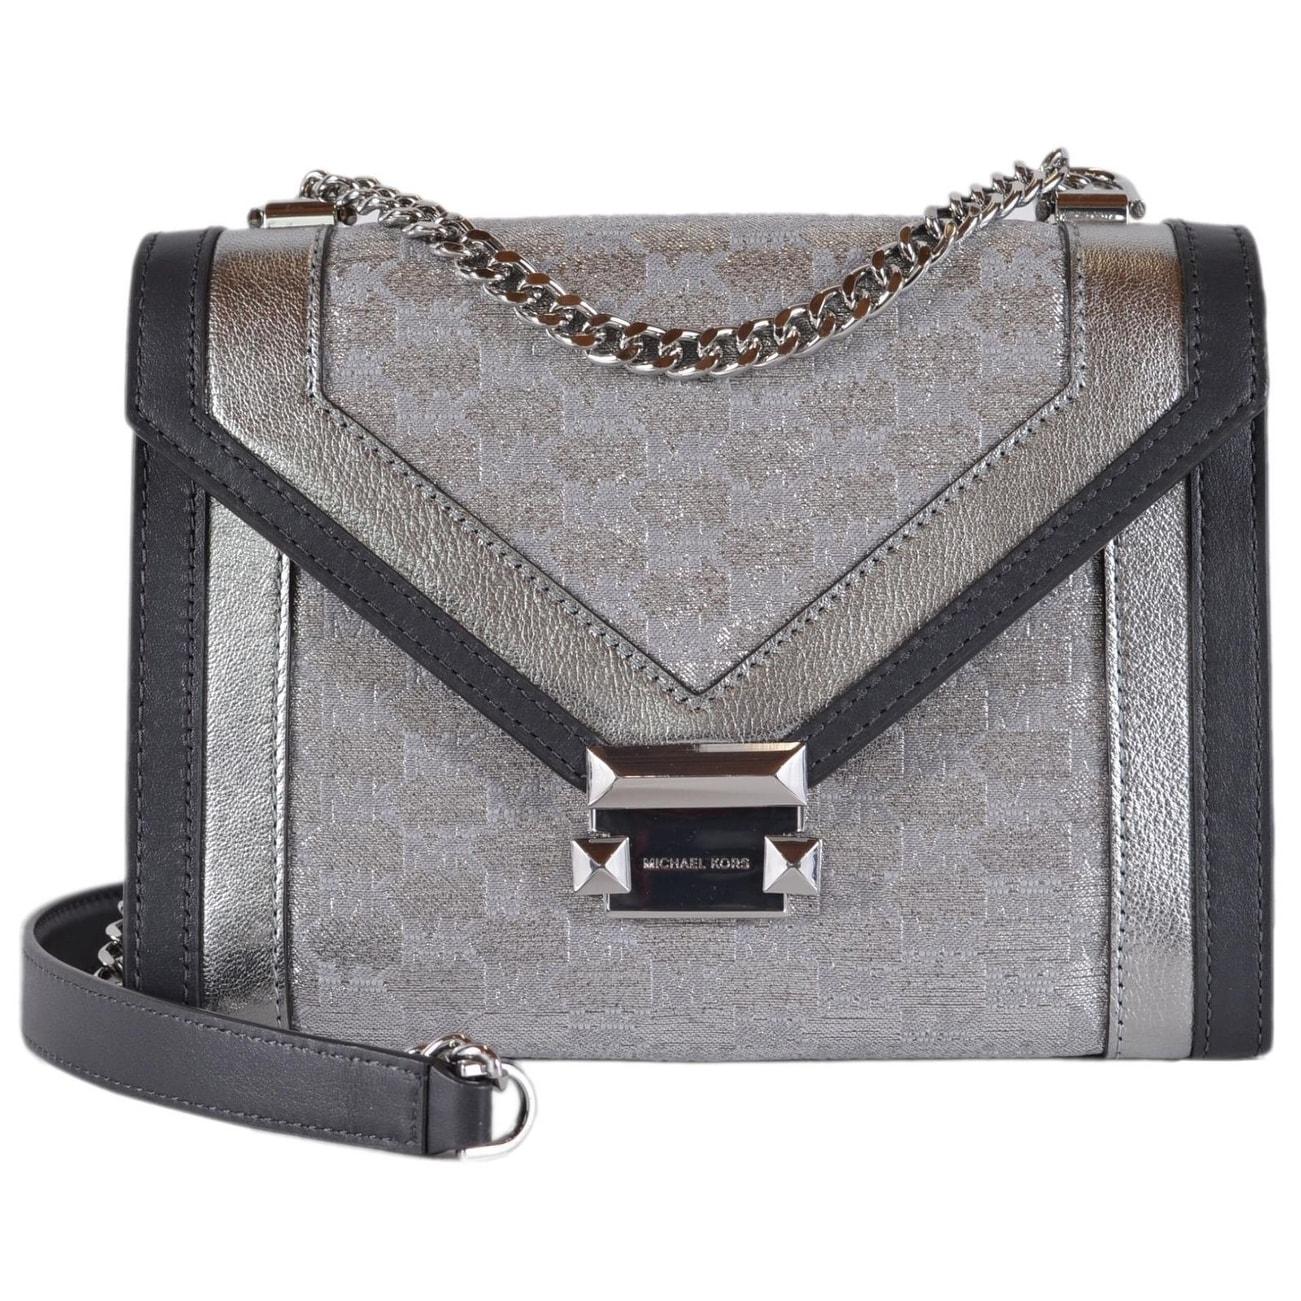 a82c5cba6c68 Michael Kors Whitney Large Metallic Logo Jacquard Convertible Shoulder Bag